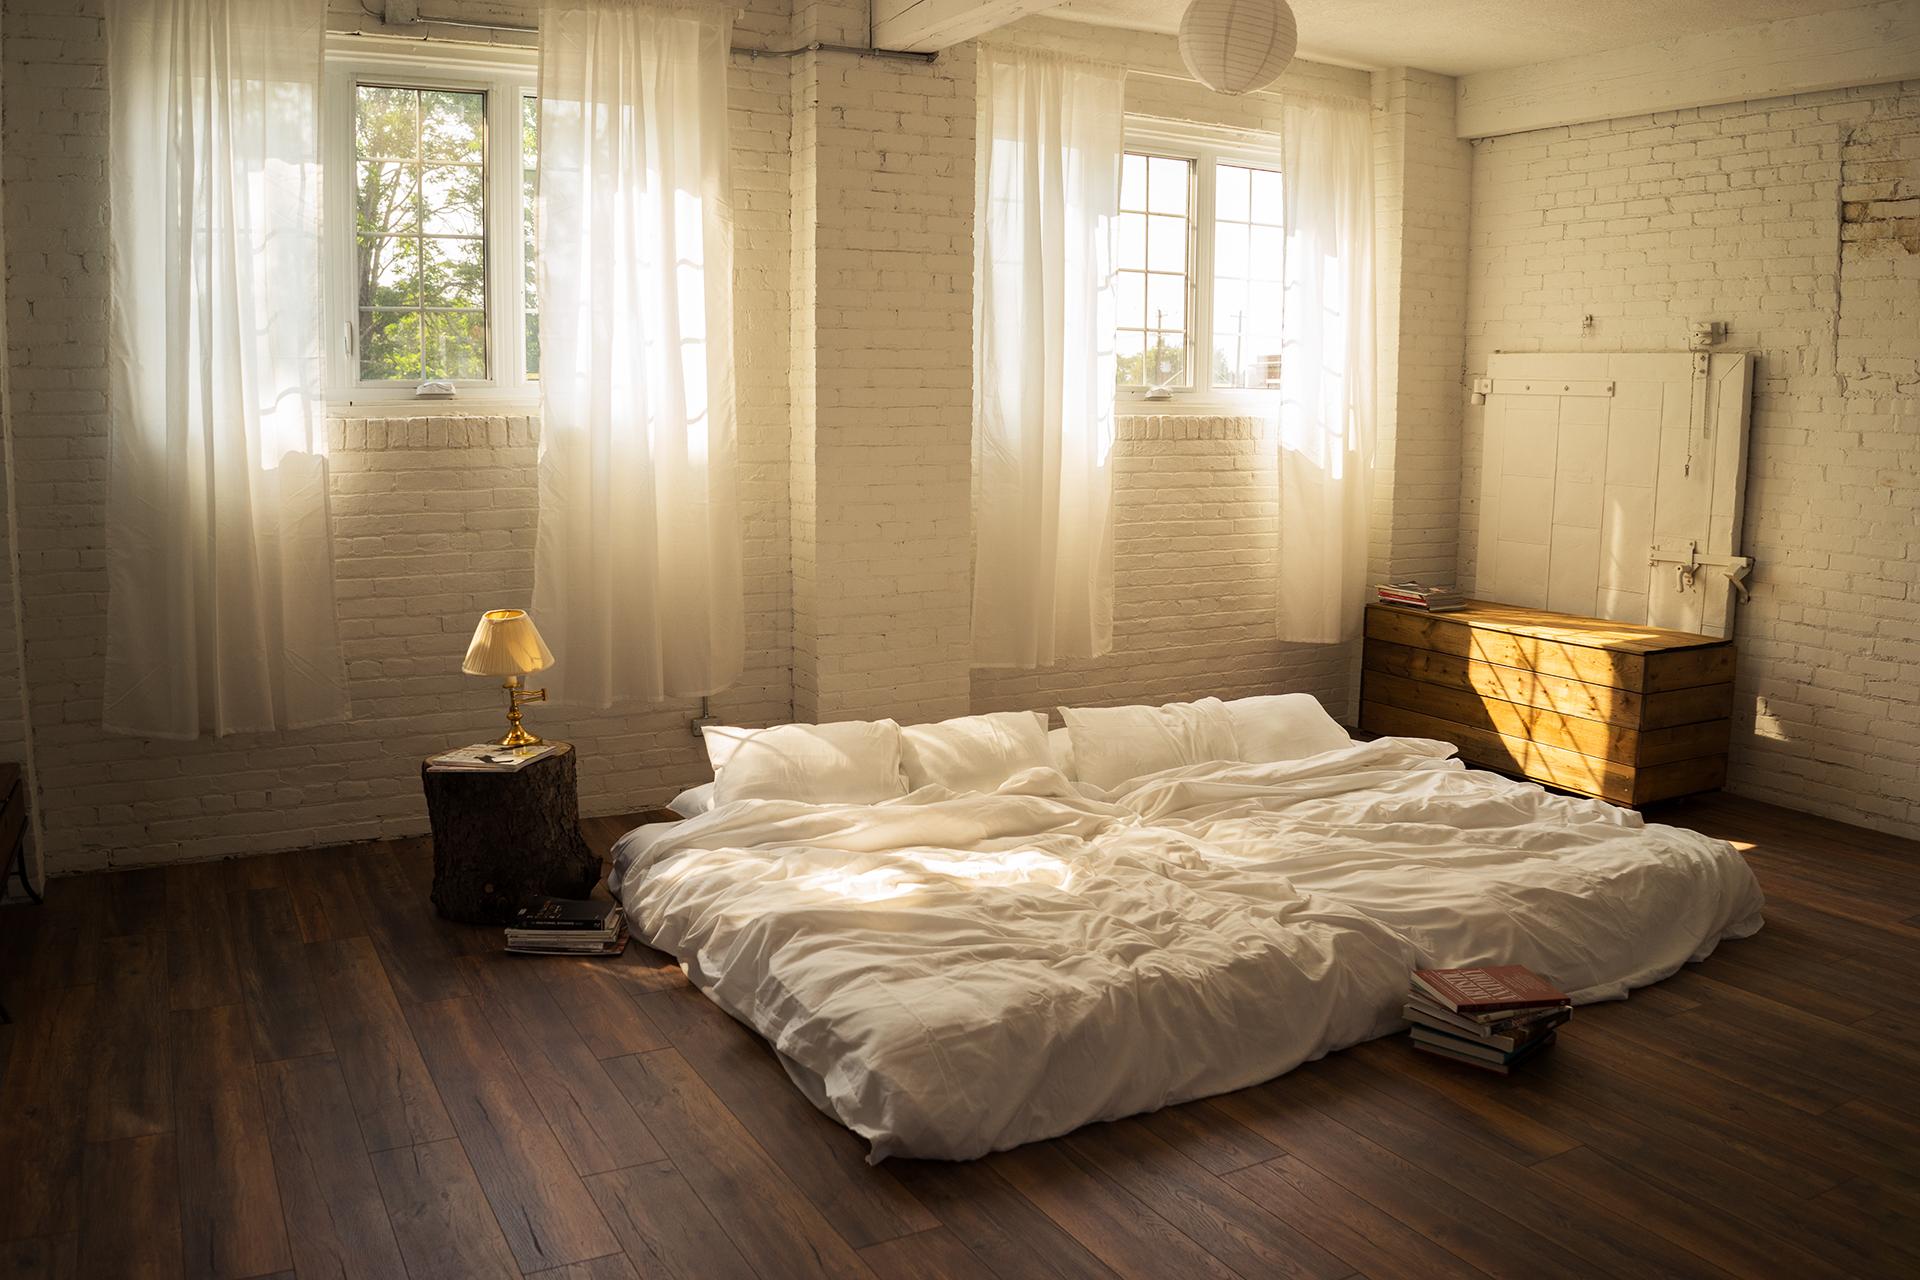 hamilton-photo-studio-the-lunar-loft-boudoir-studio-lifestyle-toronto-niagara+(6).jpg